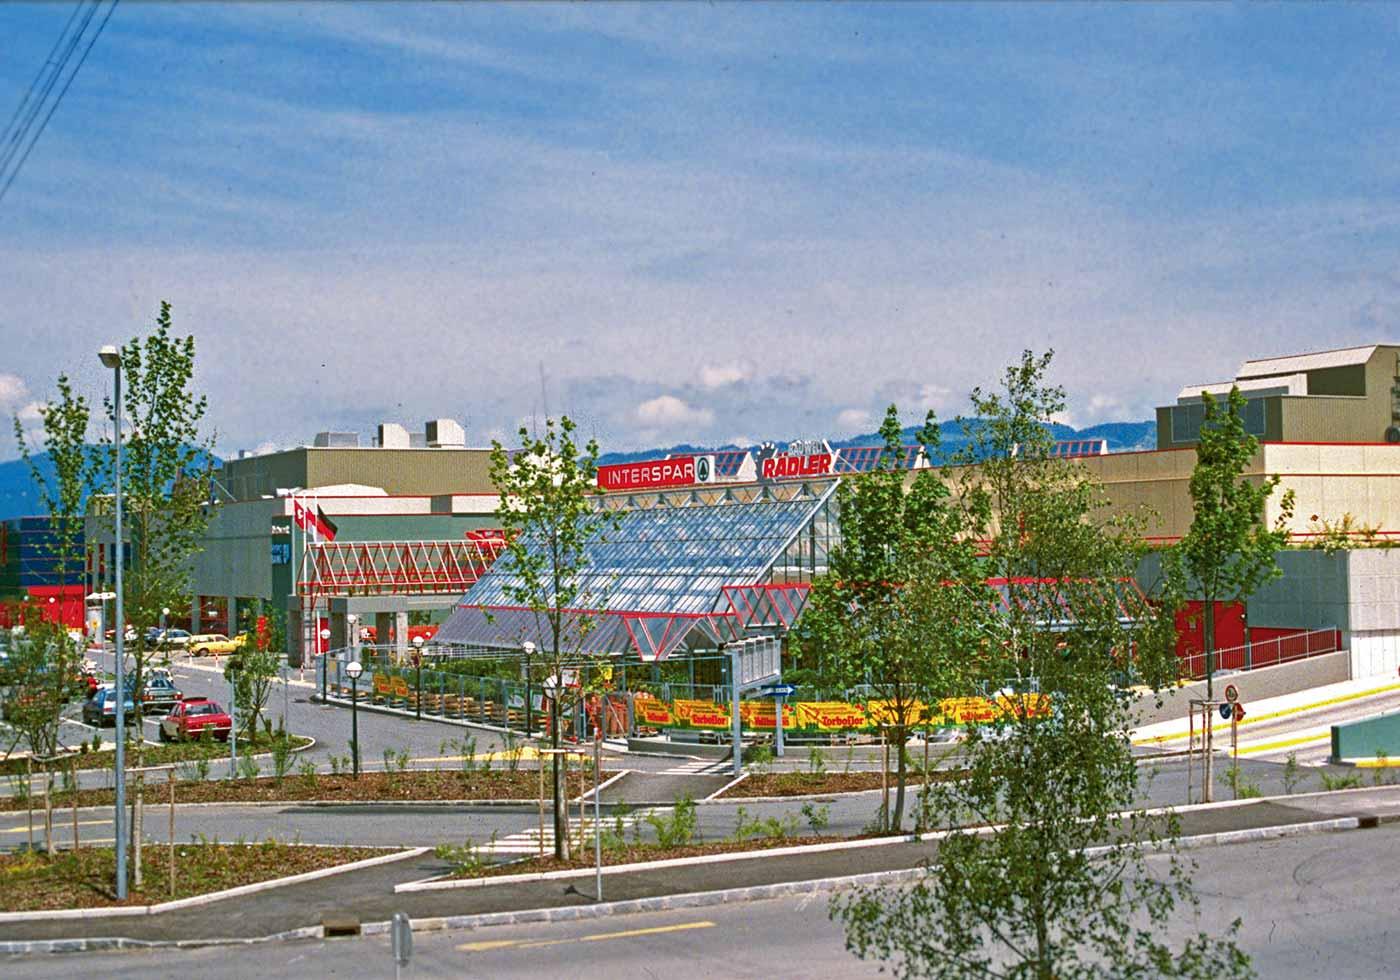 Messepark, Dornbirn, AT